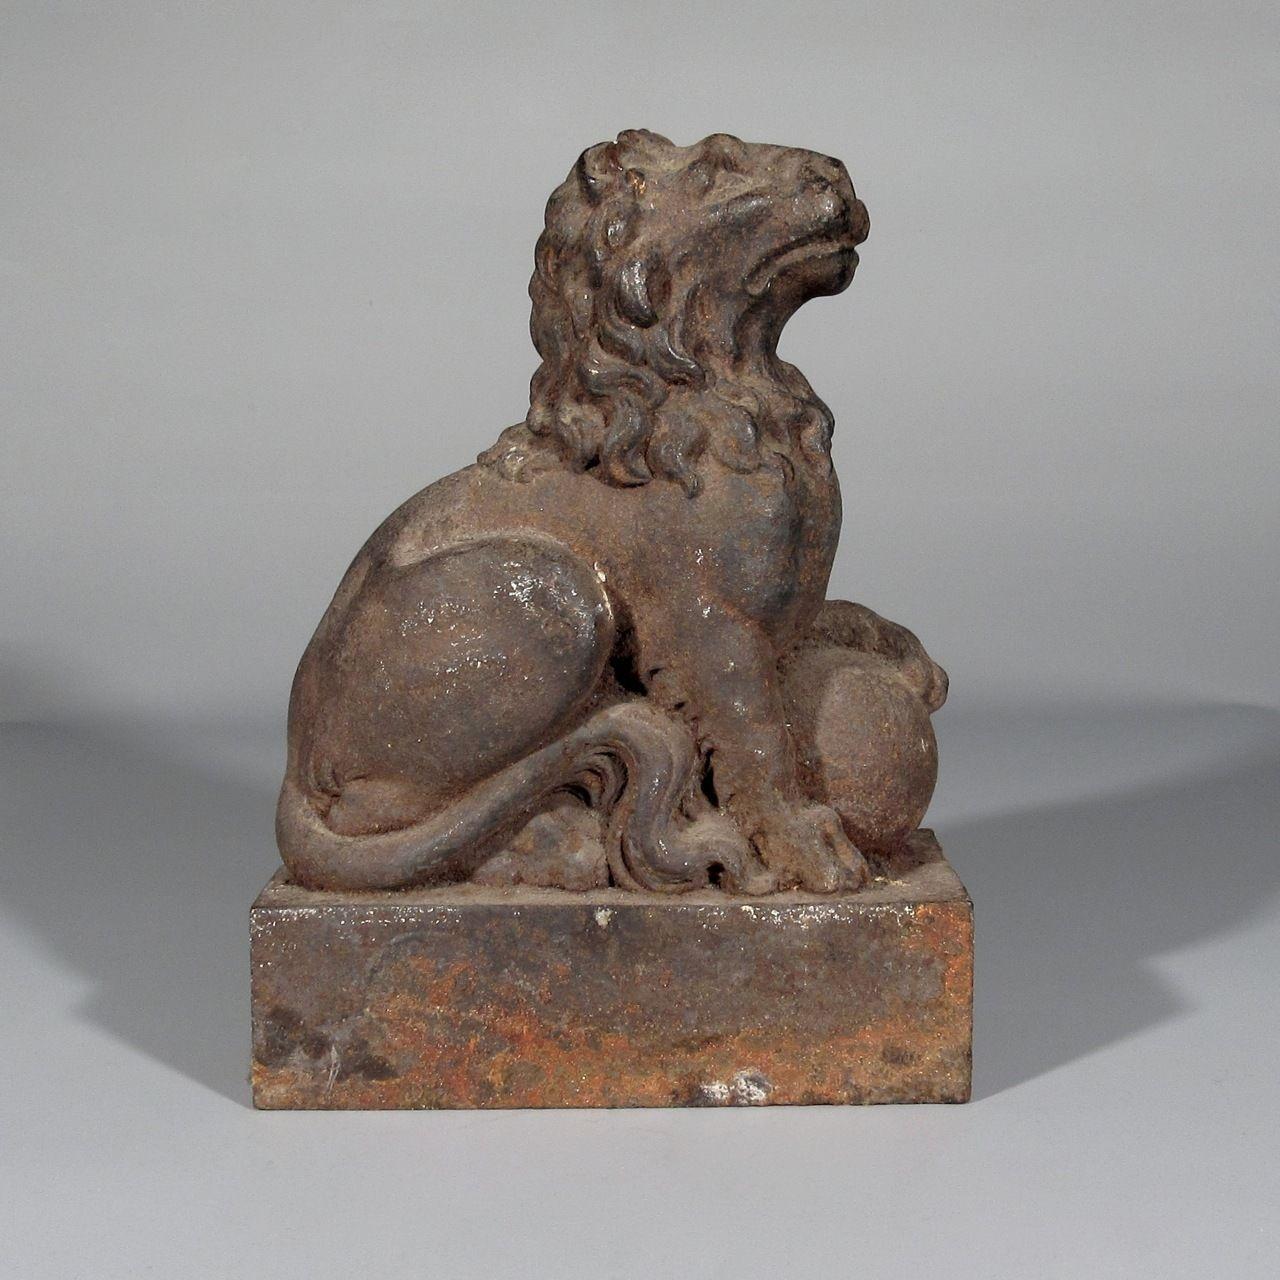 Antique french Cast Iron Lion | eBayhttp://www.ebay.com/itm/Antique-French-Cast-Iron-Lion-/281593437311?pt=LH_DefaultDomain_0&hash=item419046dc7f